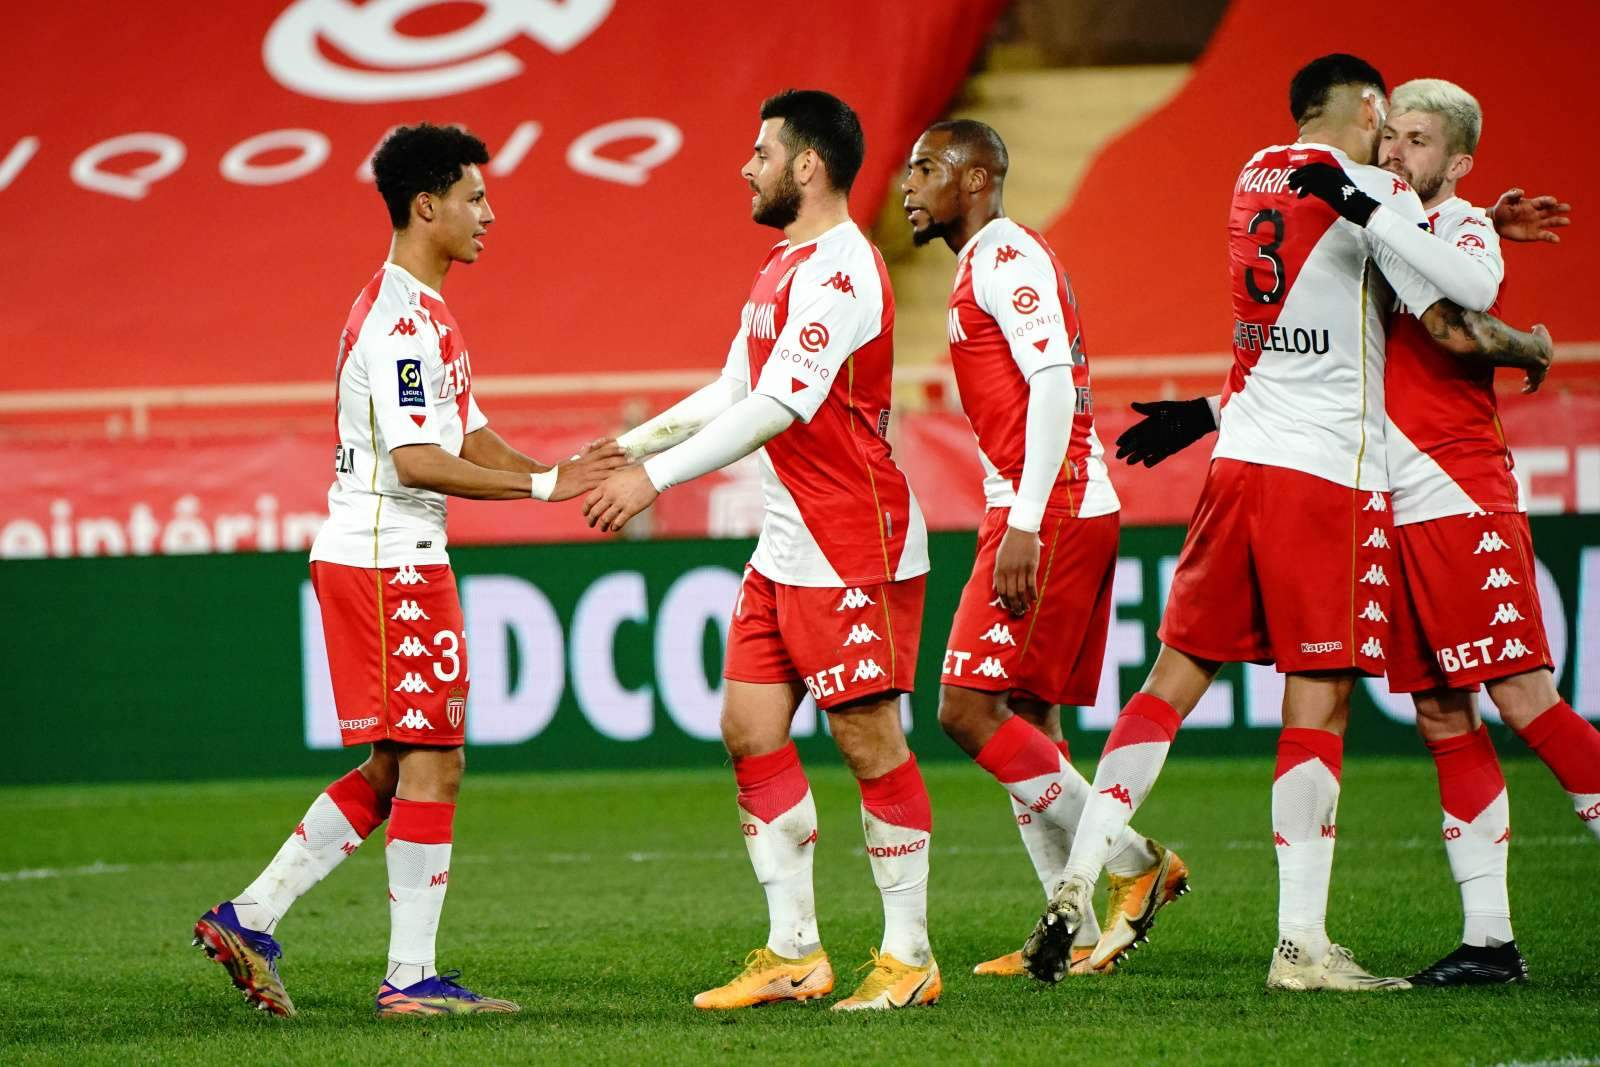 «Монако» по пенальти прошёл «Метц» в Кубке, Головин не играл